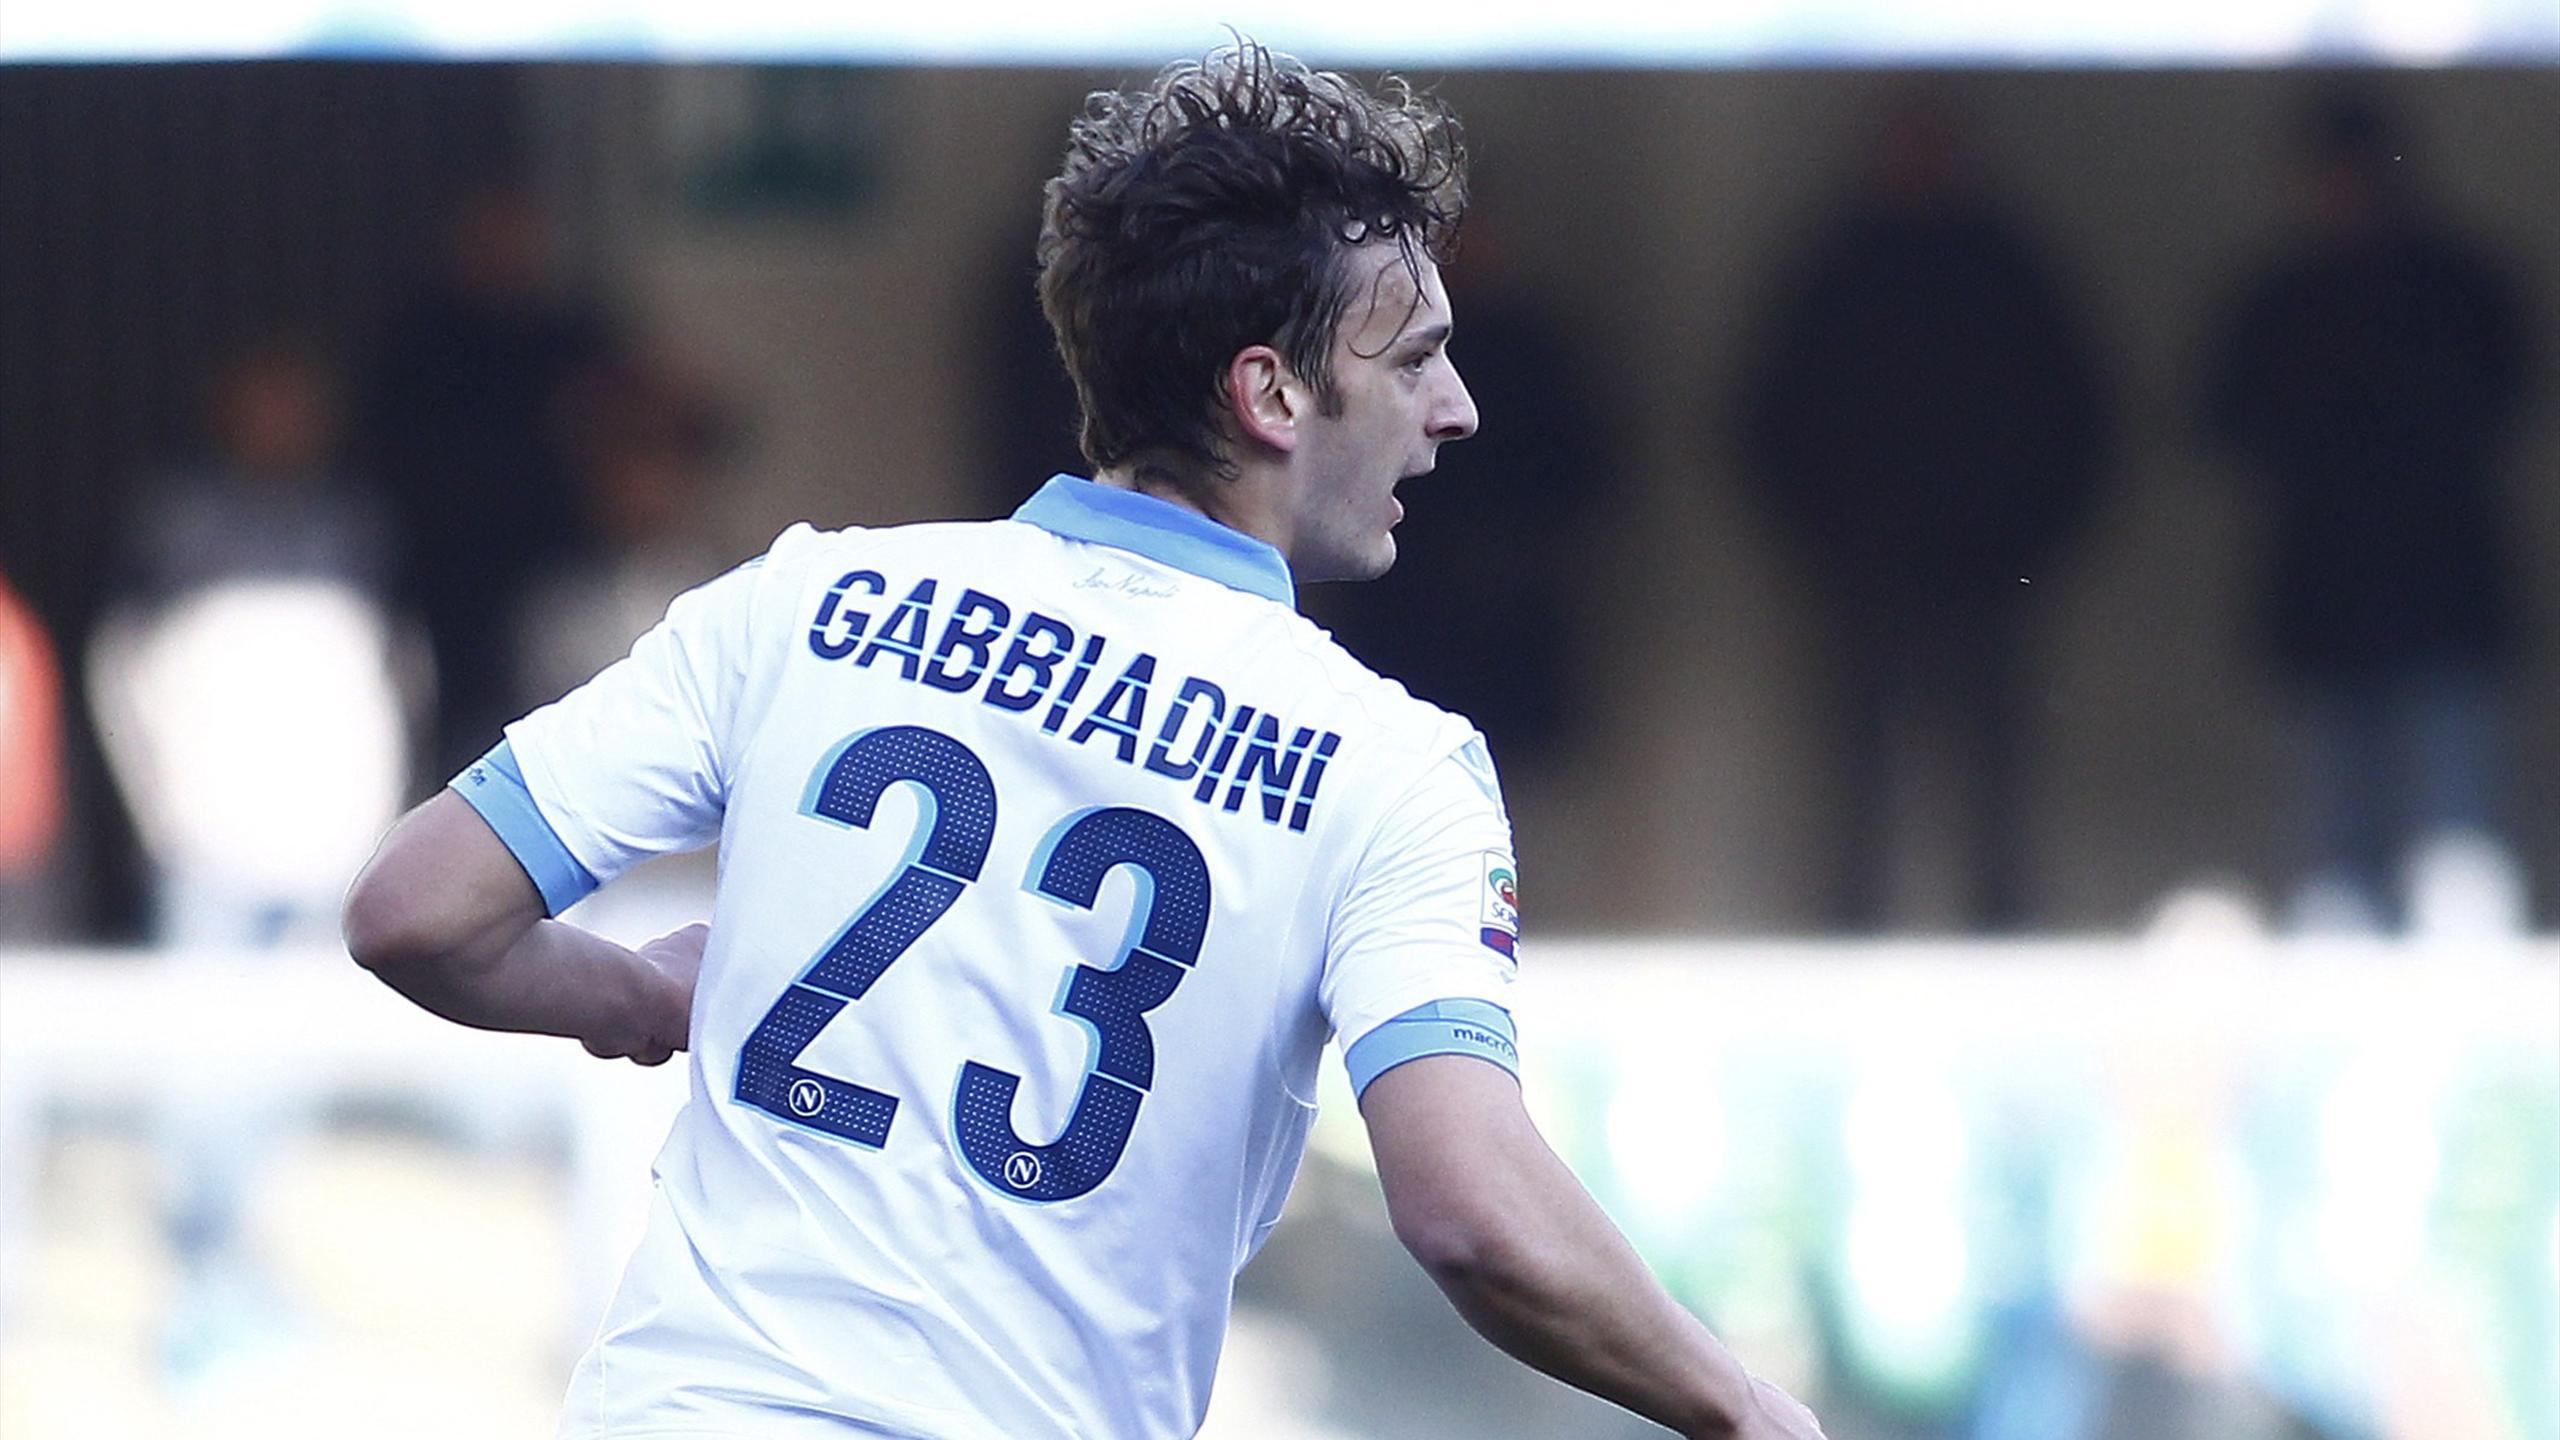 gabbiadini1